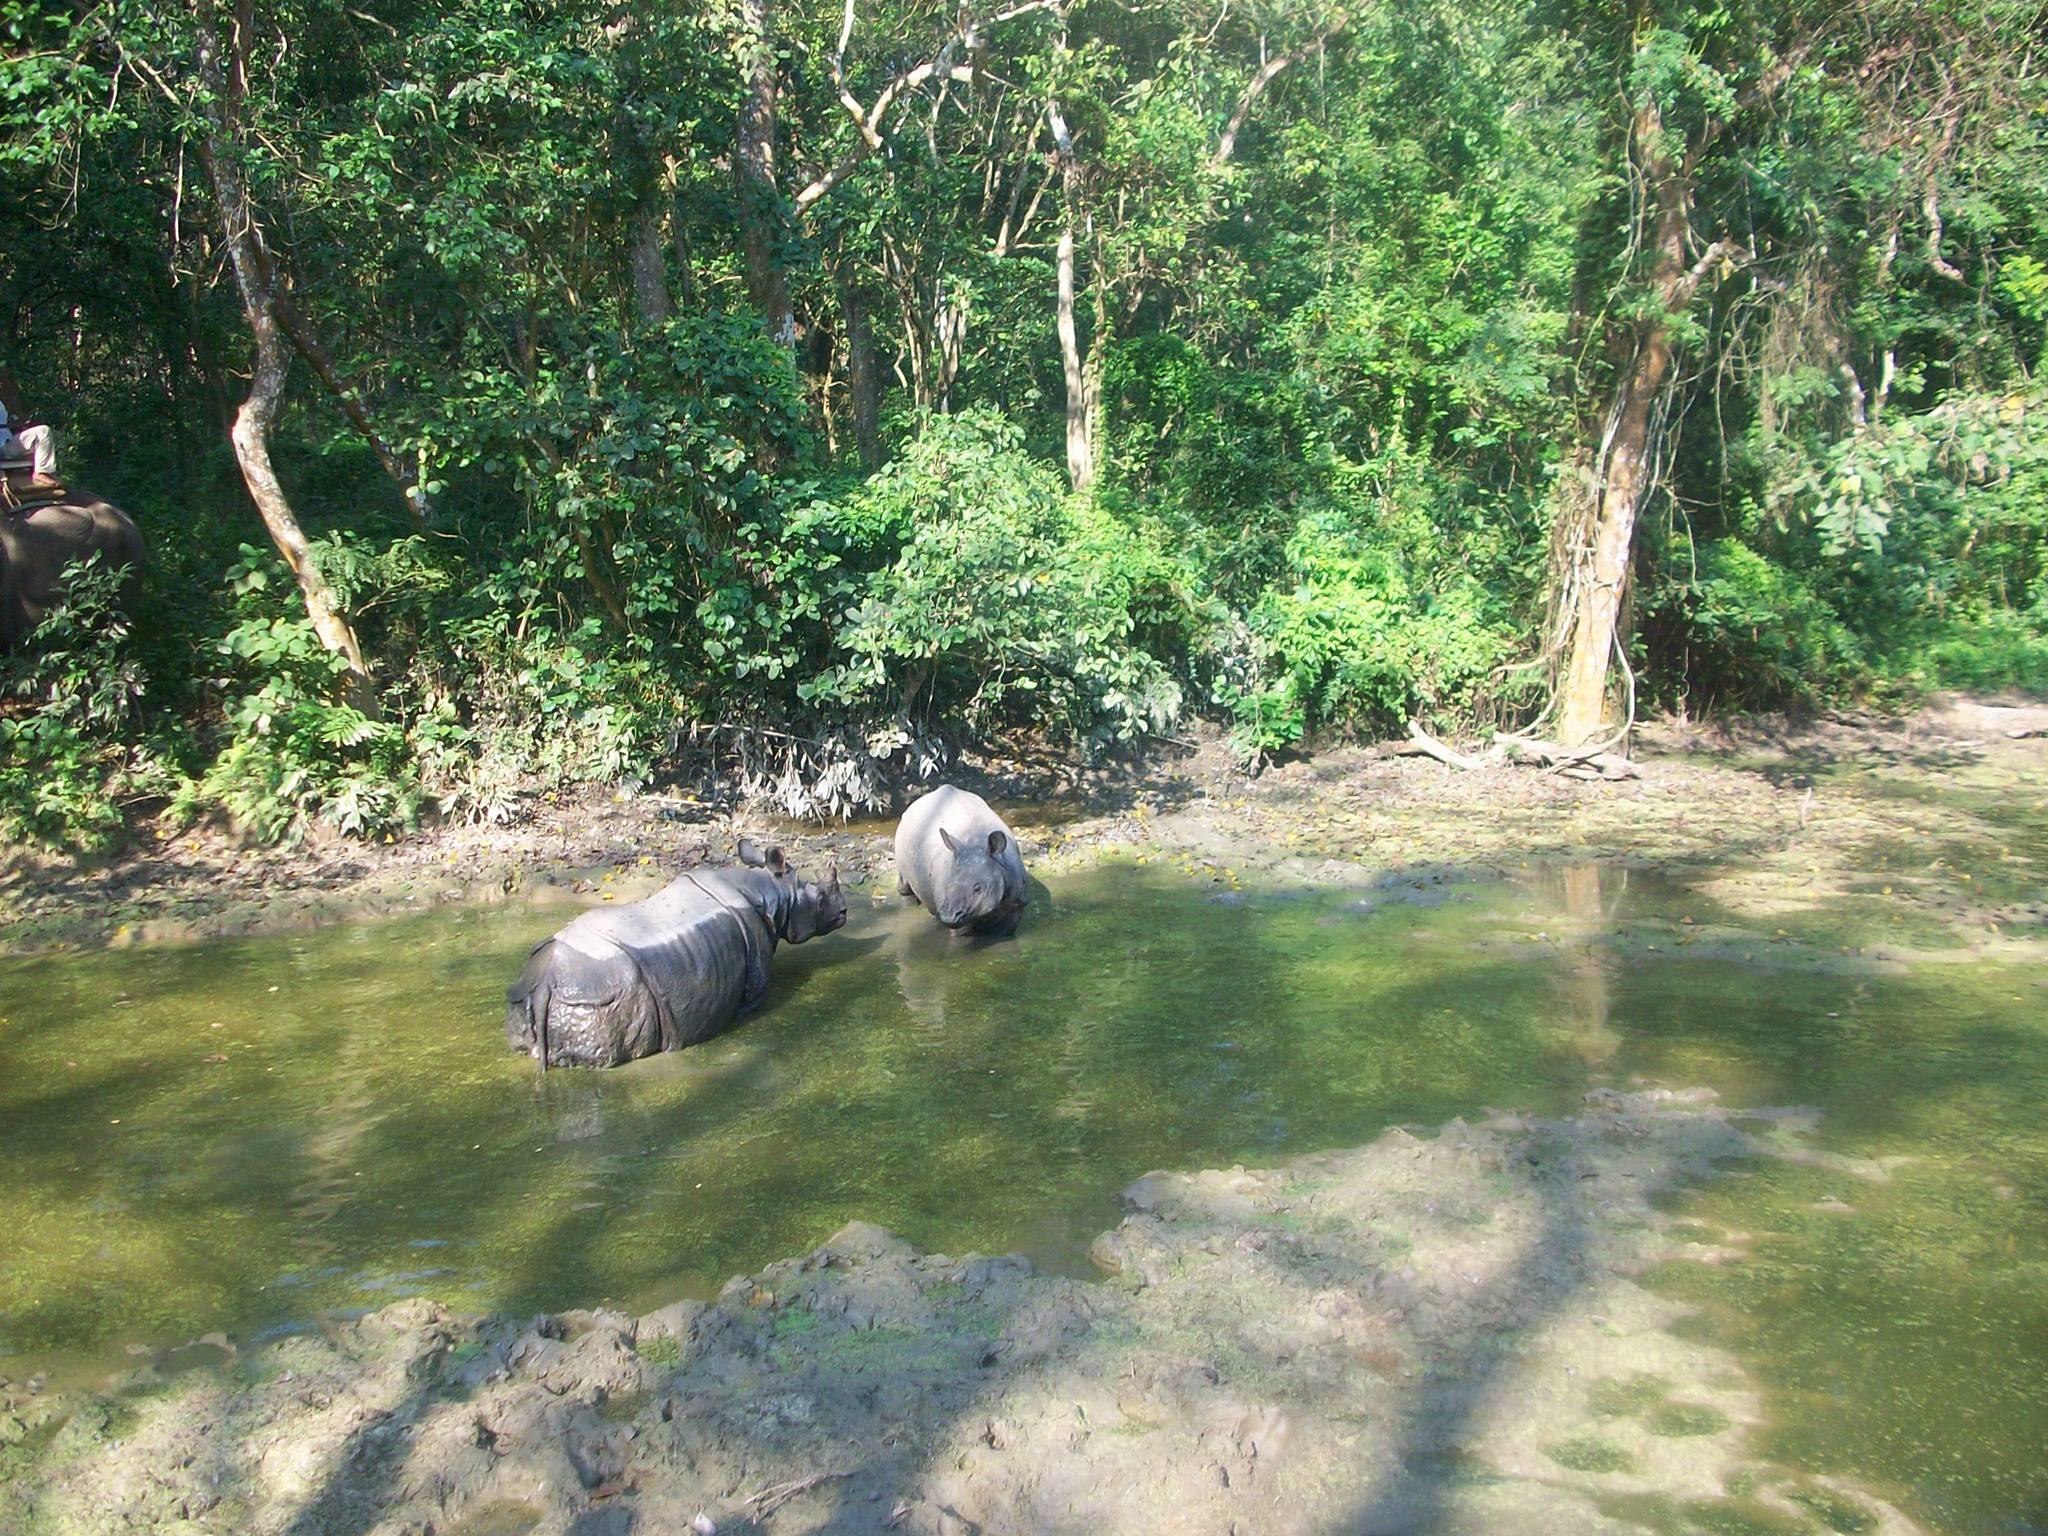 File:Asian Elephant Safari in Chitwan National Park, Chitwan, Nepal